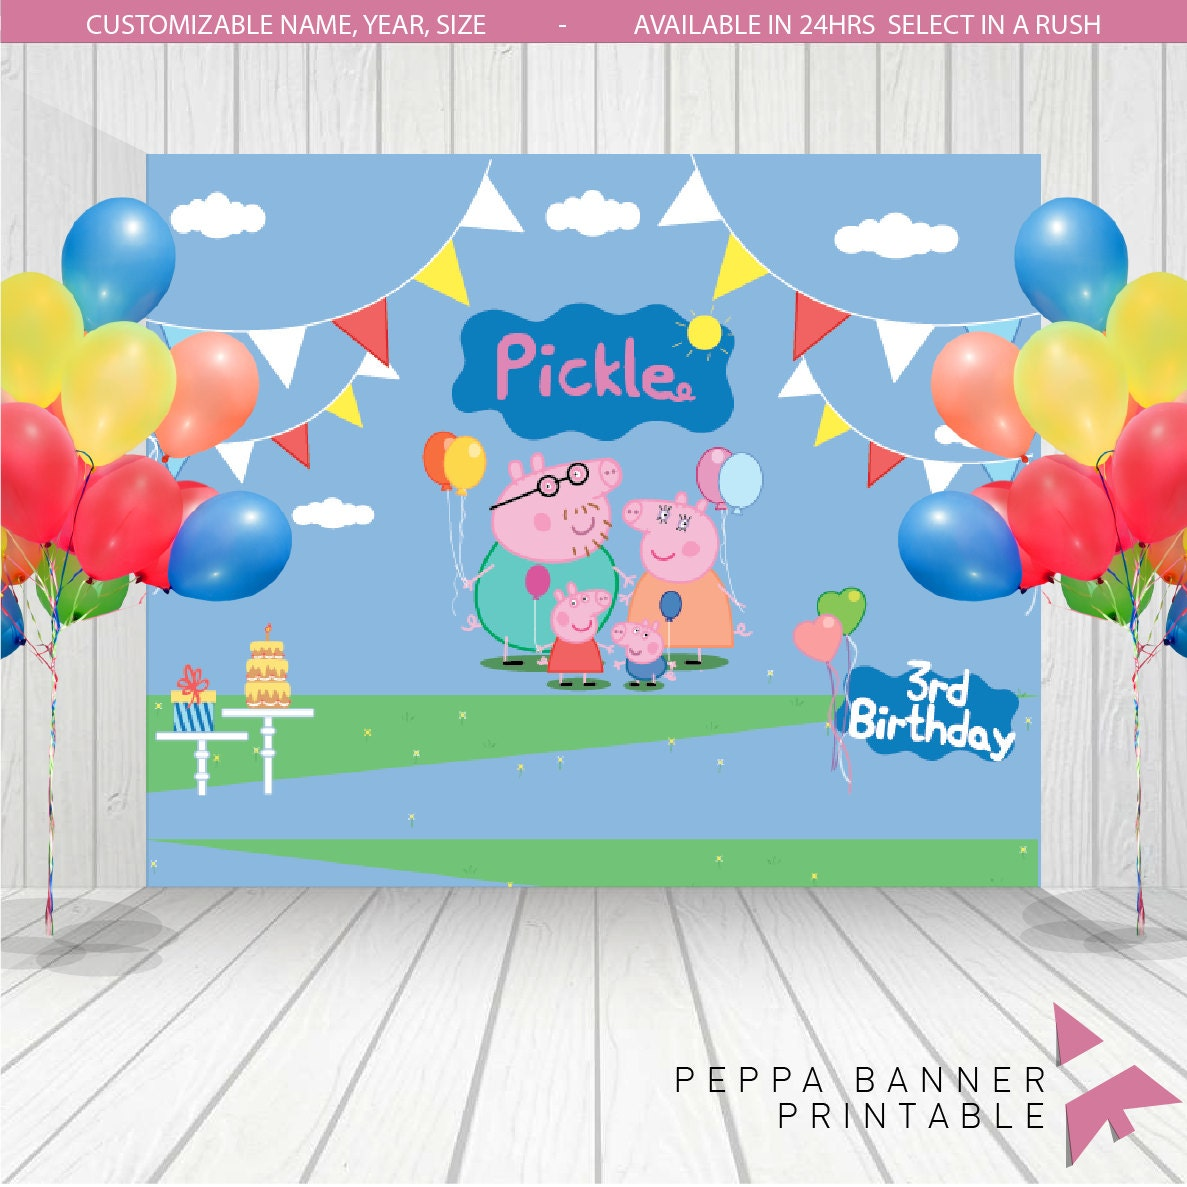 Peppa Pig Backdrop Peppa Pig Birthday Banner